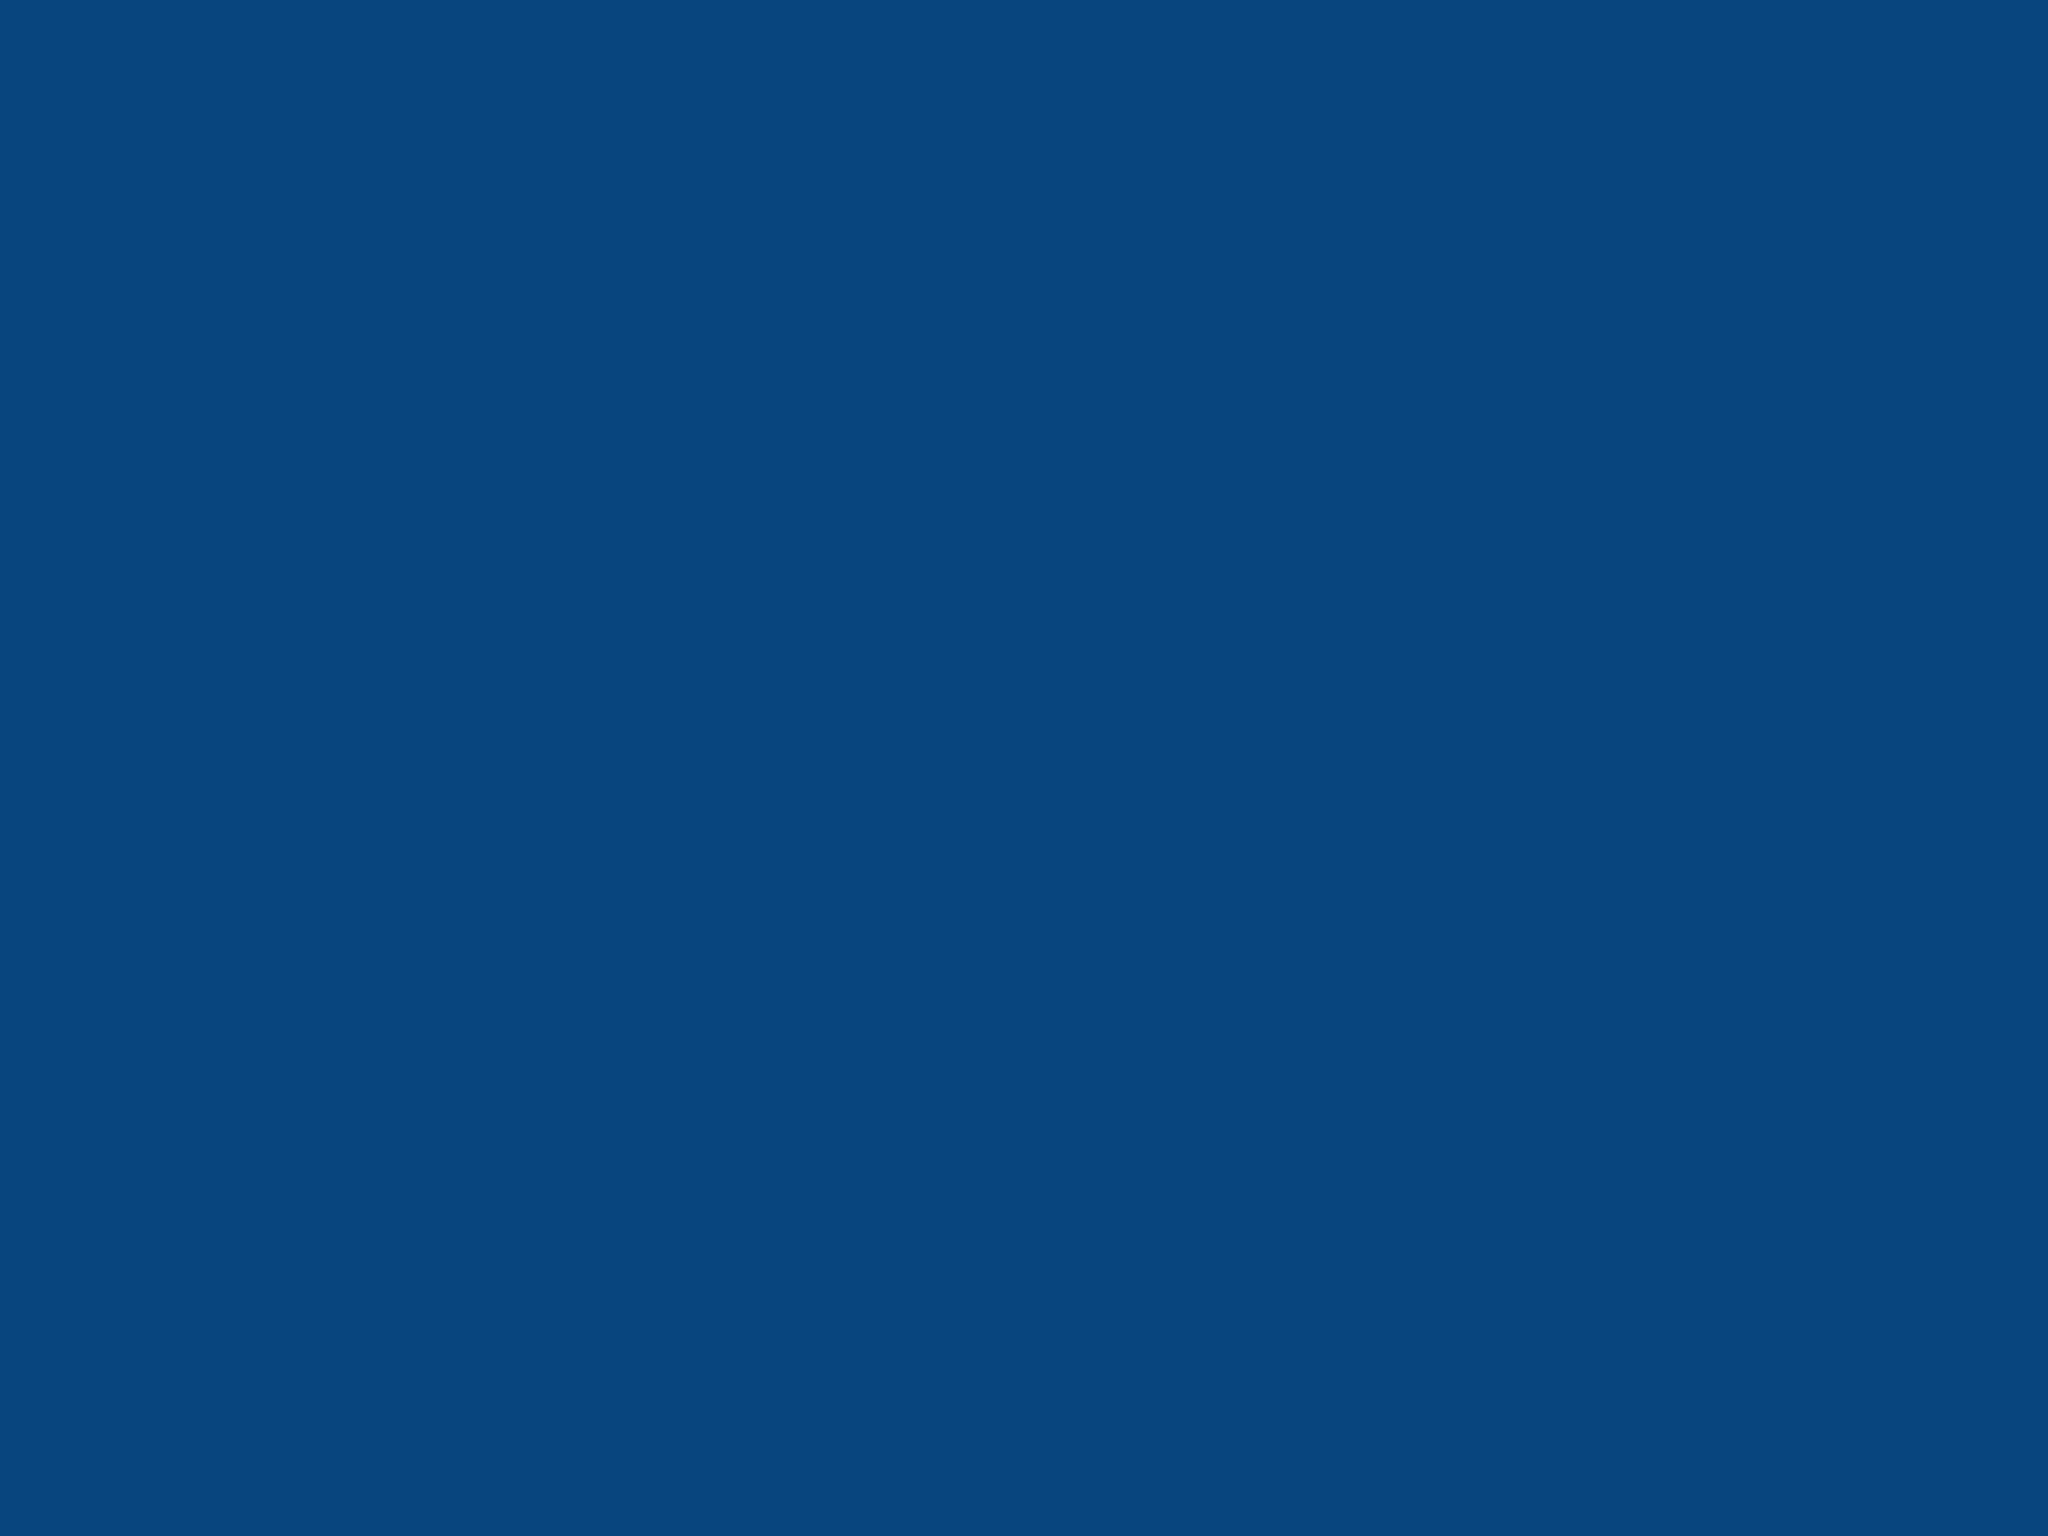 2048x1536 Dark Cerulean Solid Color Background